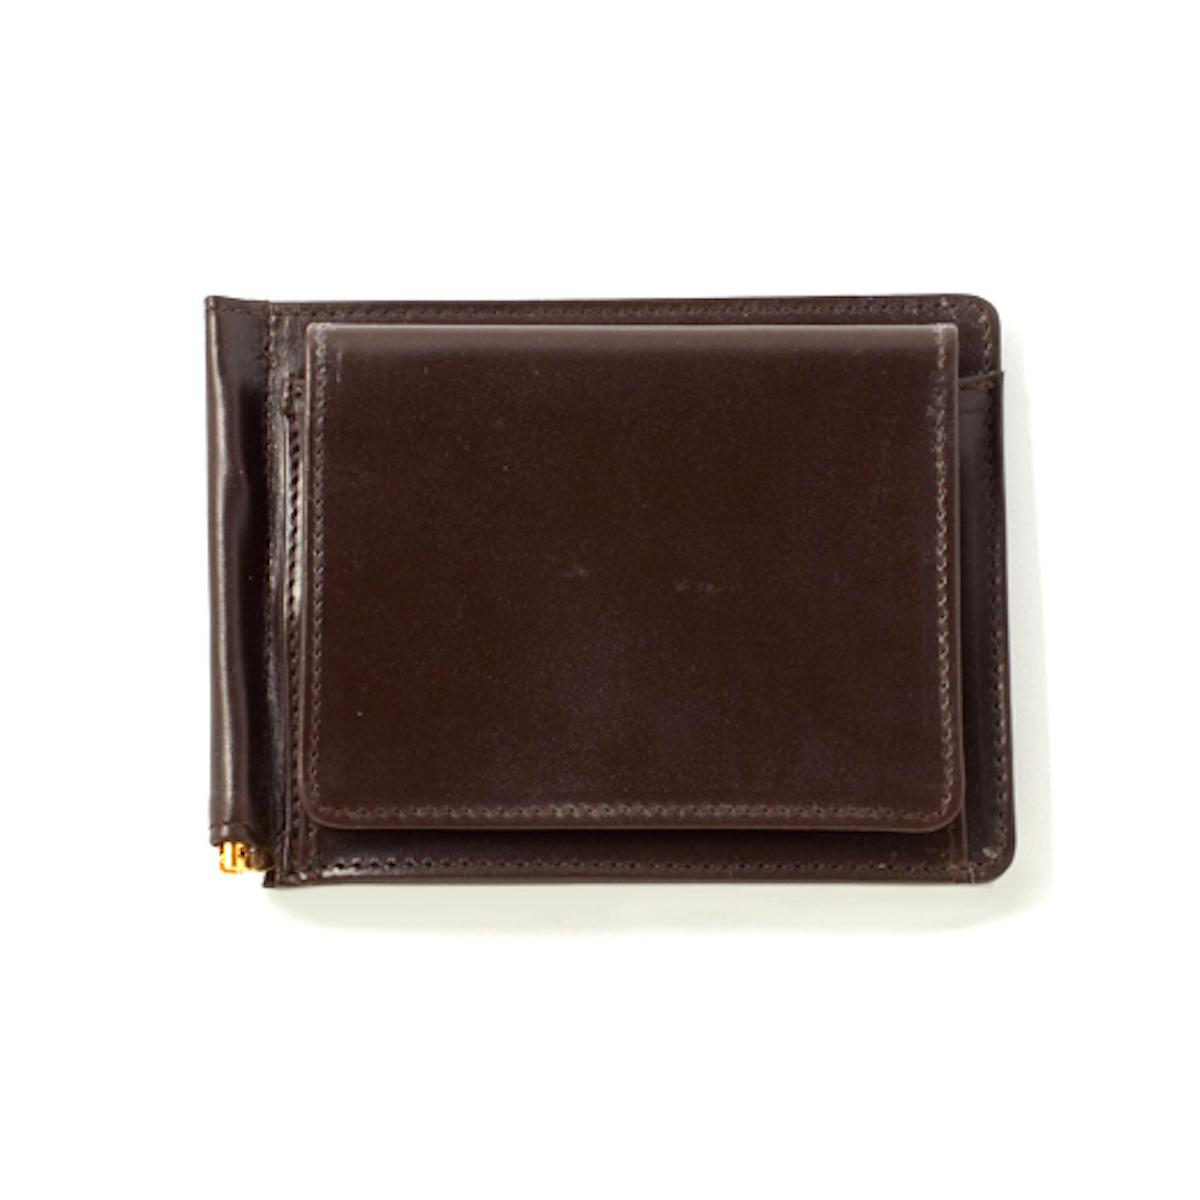 GLENROYAL / MONEY CLIP WITH COIN POCKET -CIGAR